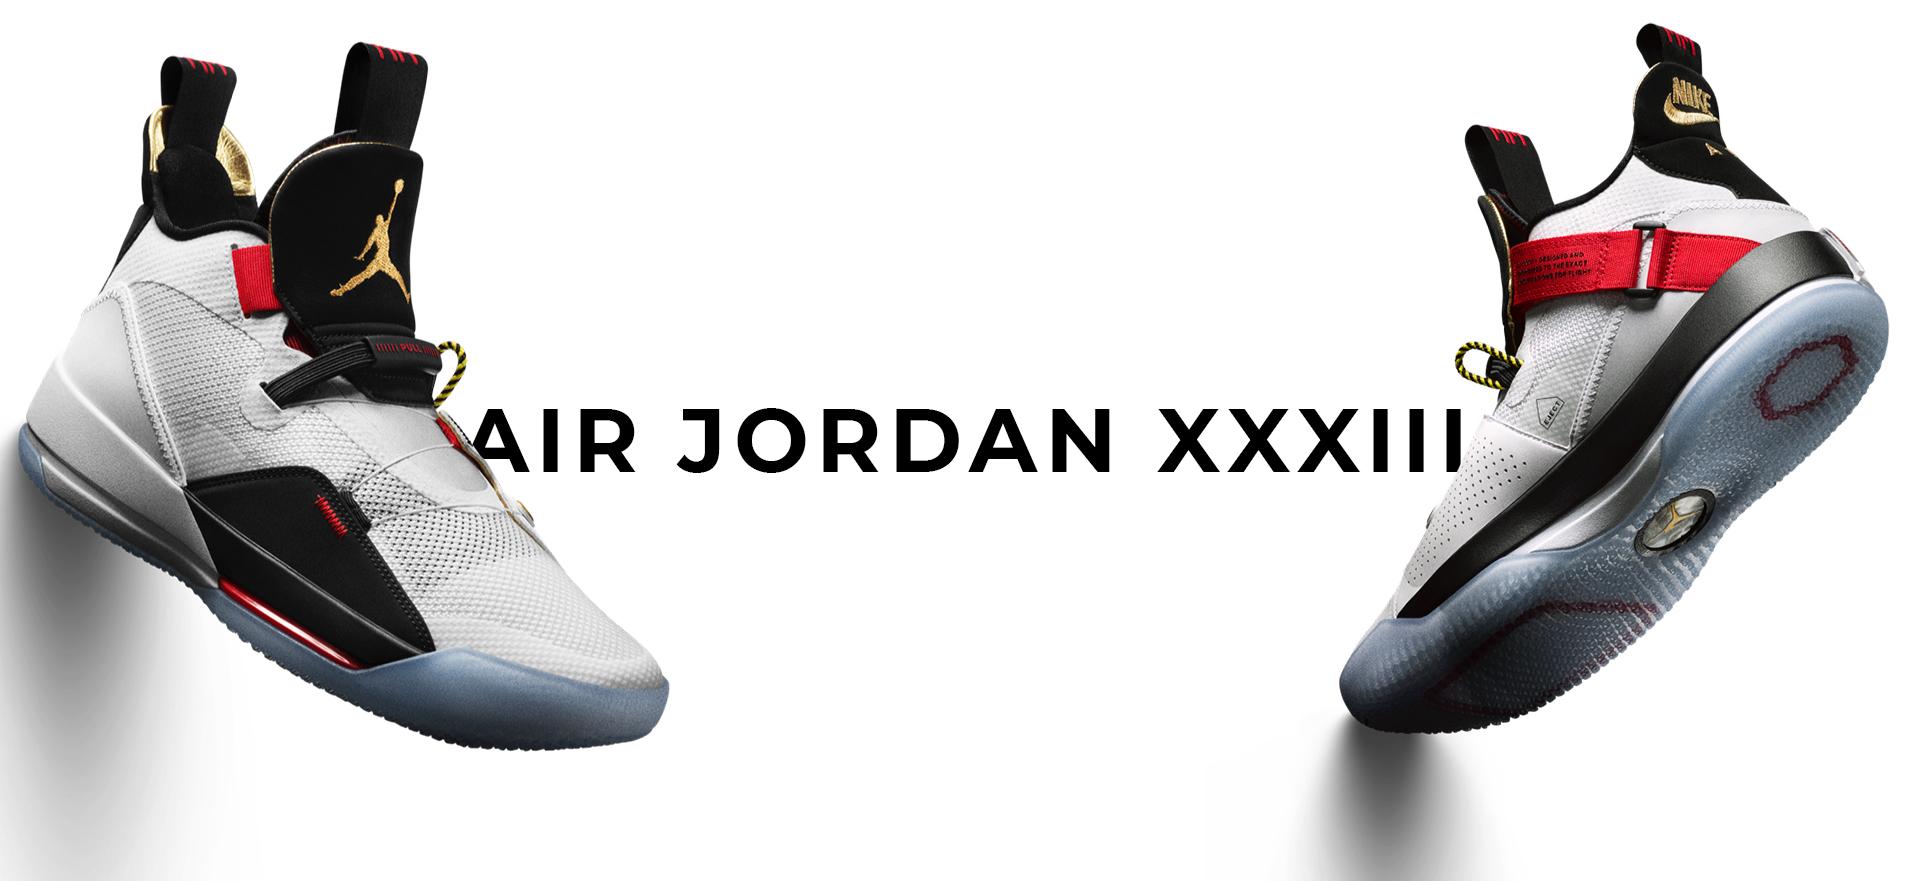 Air Jordan XXXIII — mcmag.ru — все модели джордан